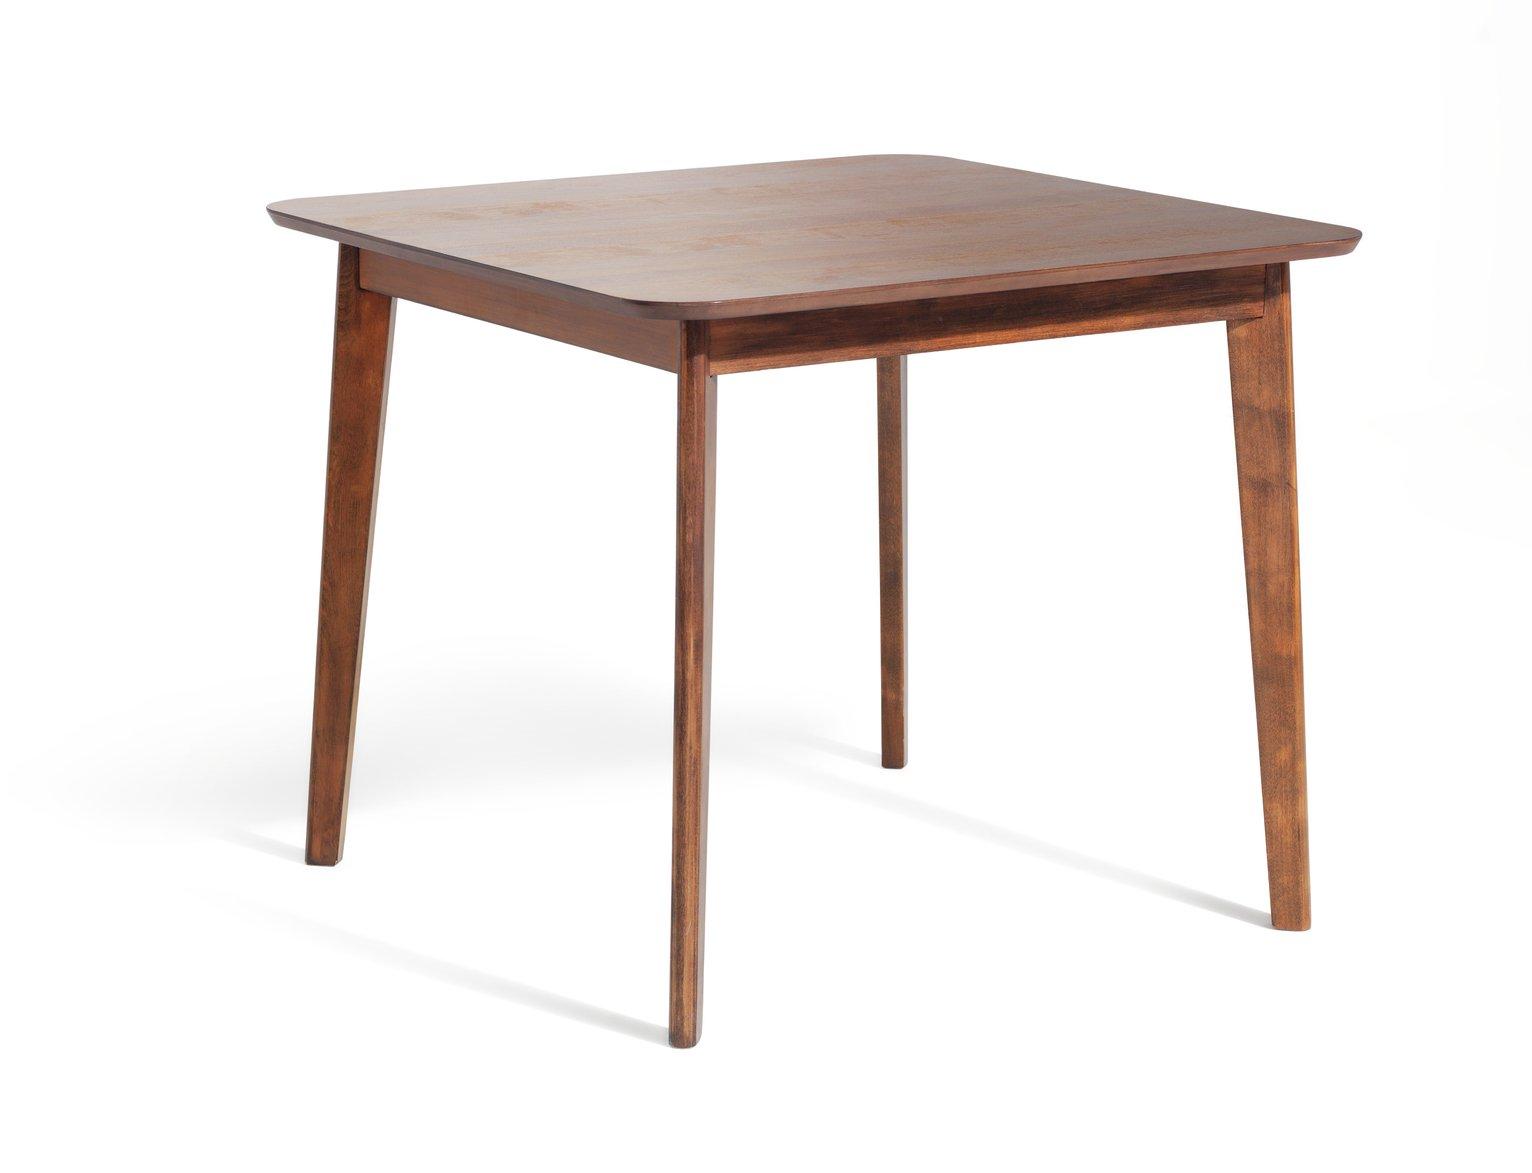 Habitat Skandi Walnut Veneer 4 Seater Dining Table